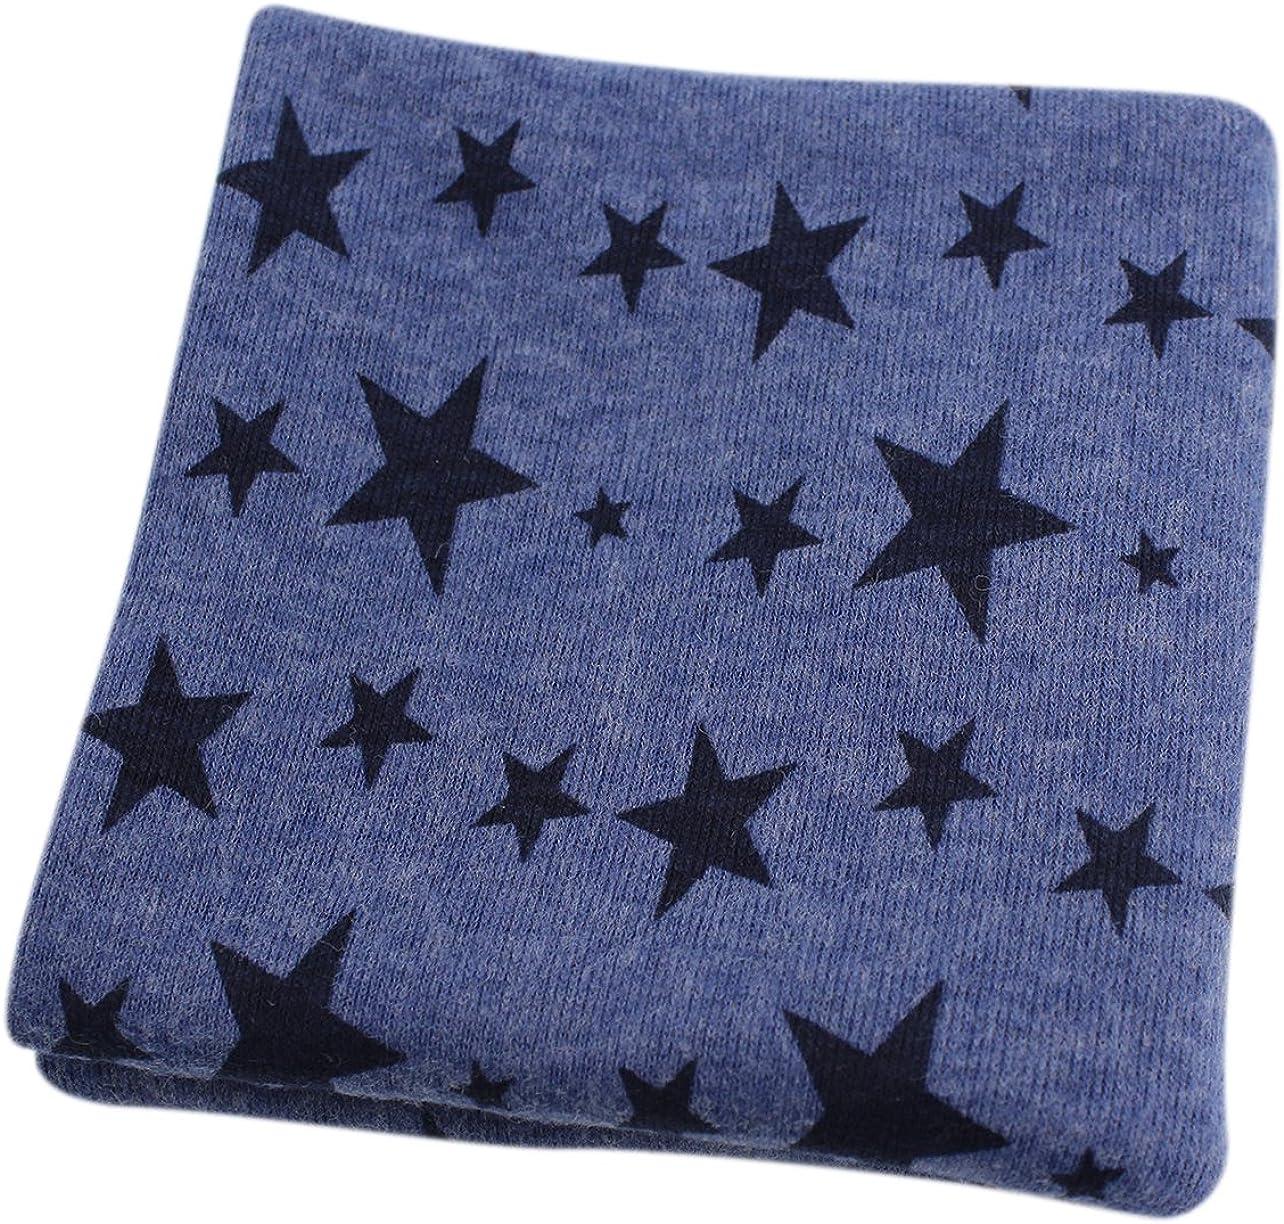 RARITY-US Unisex Baby Toddler Kids Knit Loop Scarf Winter Warm Cotton Wrap Shawl Scarf Neckwarmer